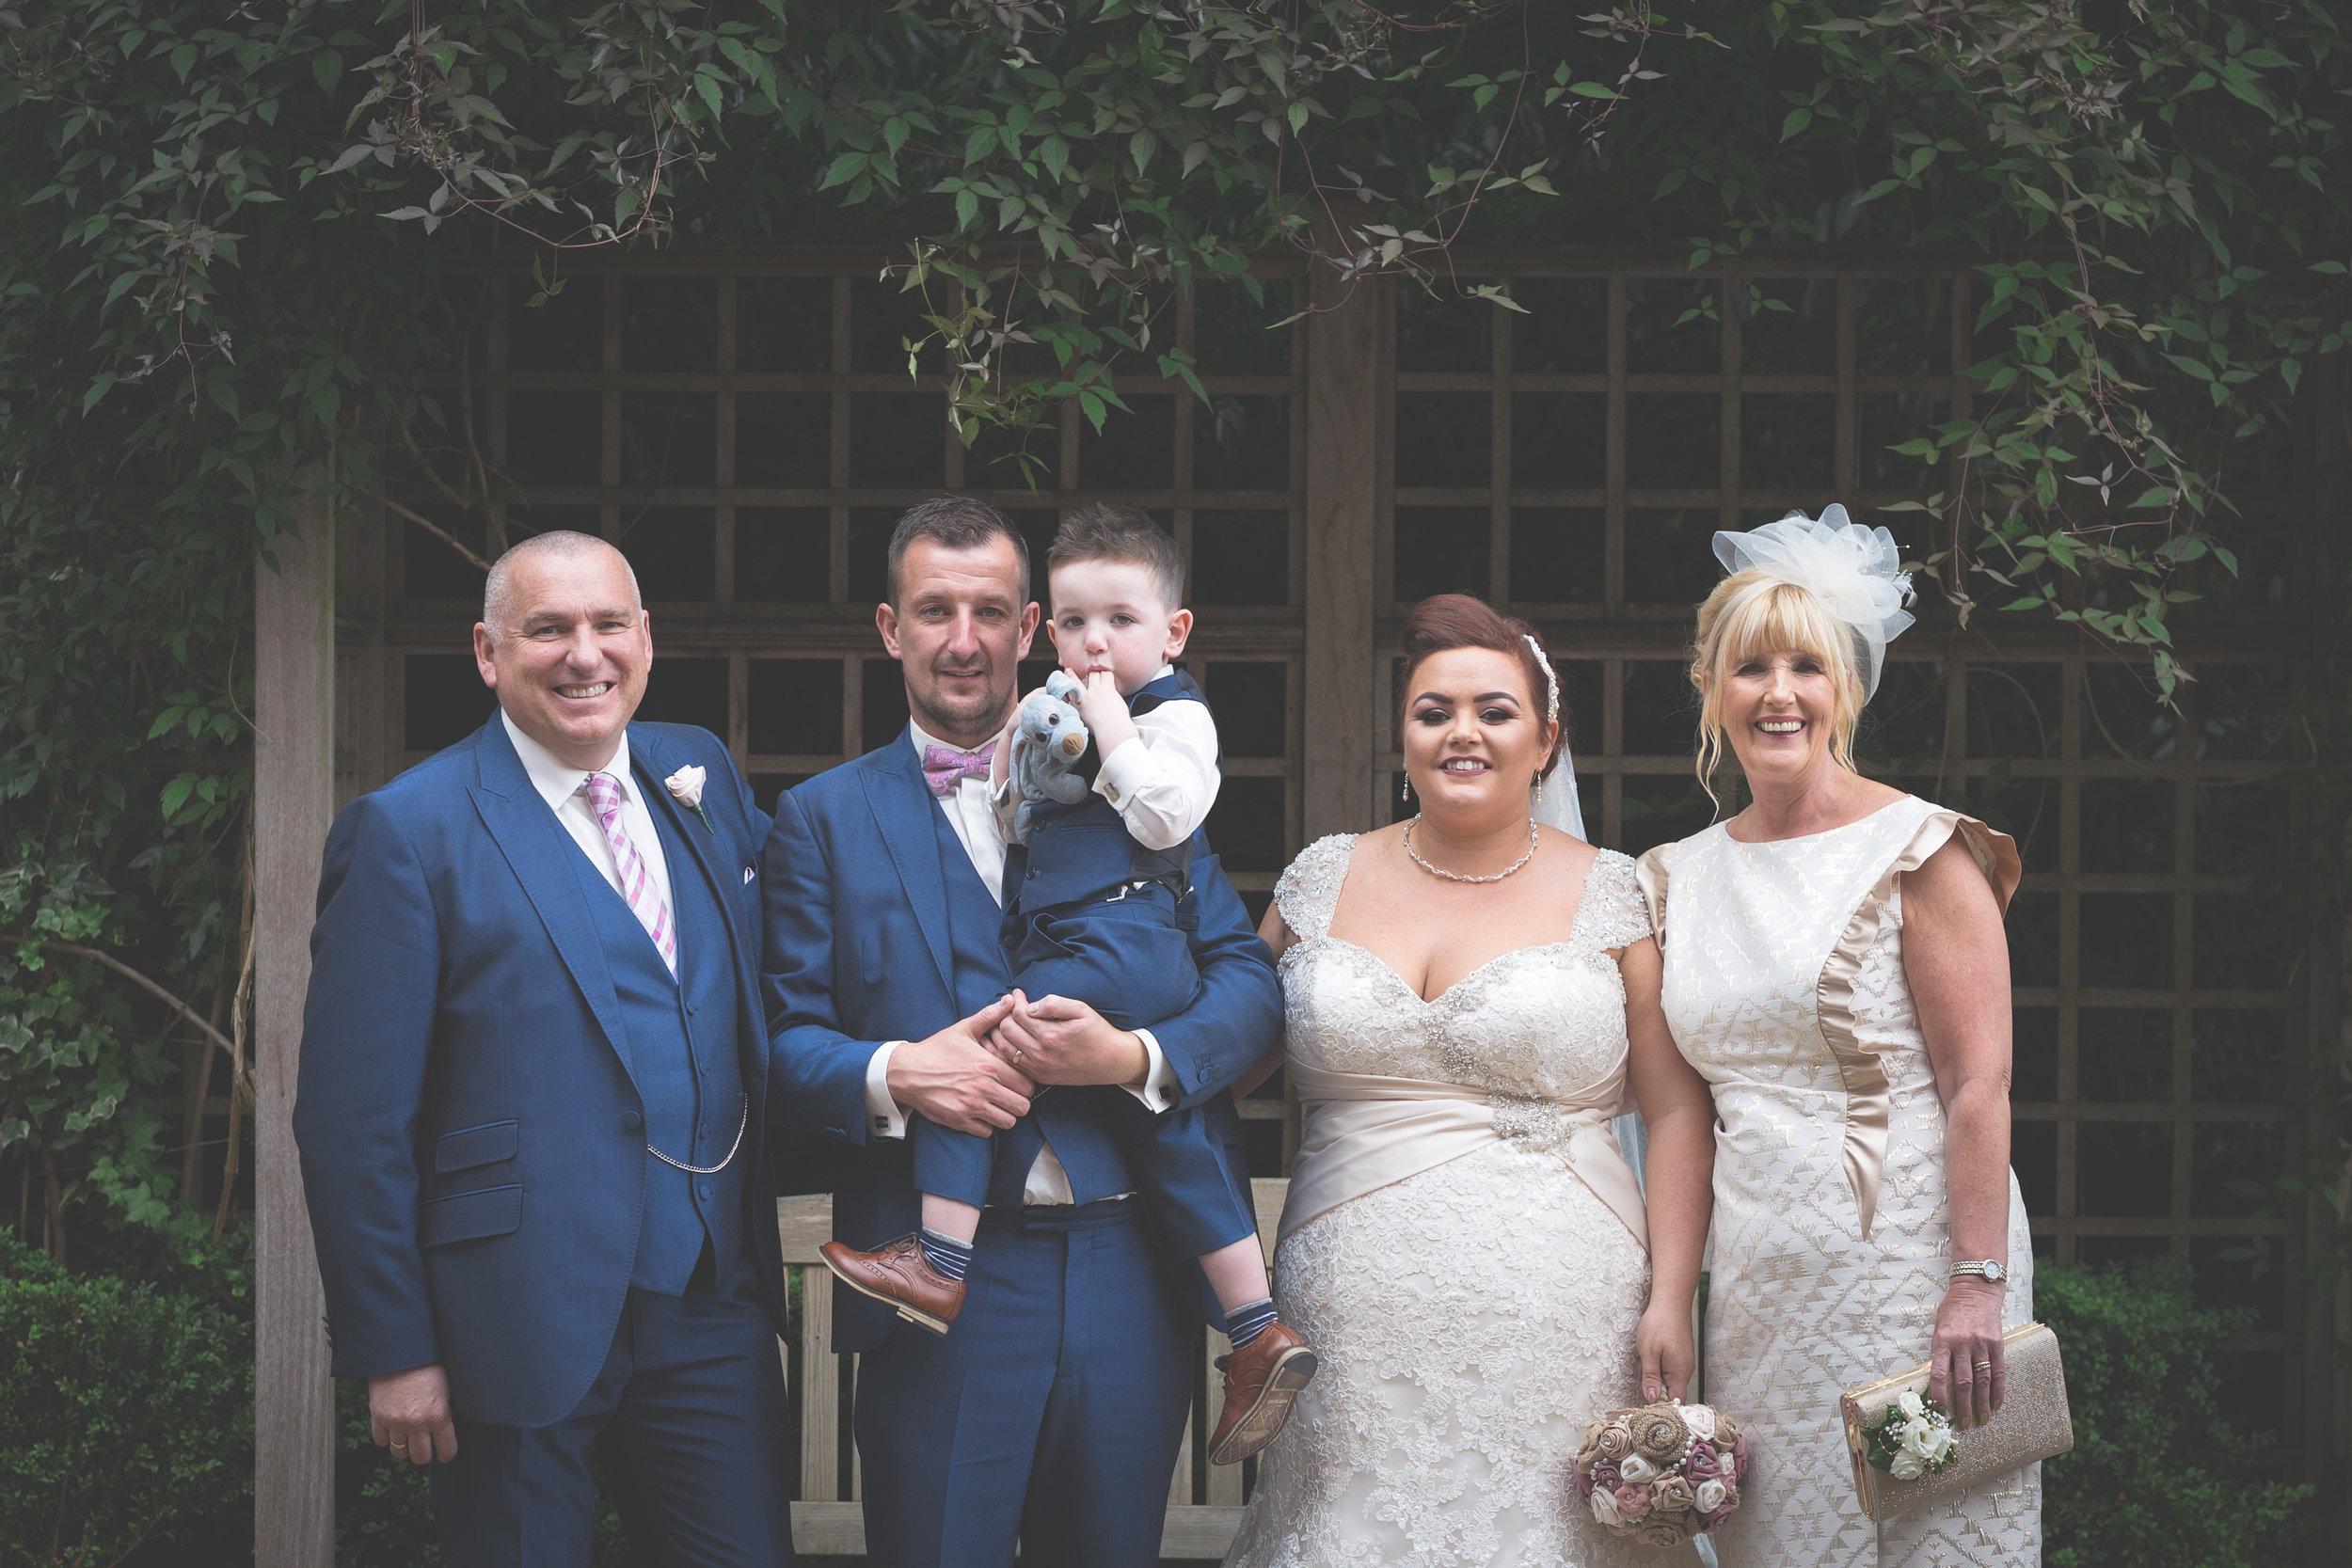 Antoinette & Stephen - Portraits   Brian McEwan Photography   Wedding Photographer Northern Ireland 51.jpg